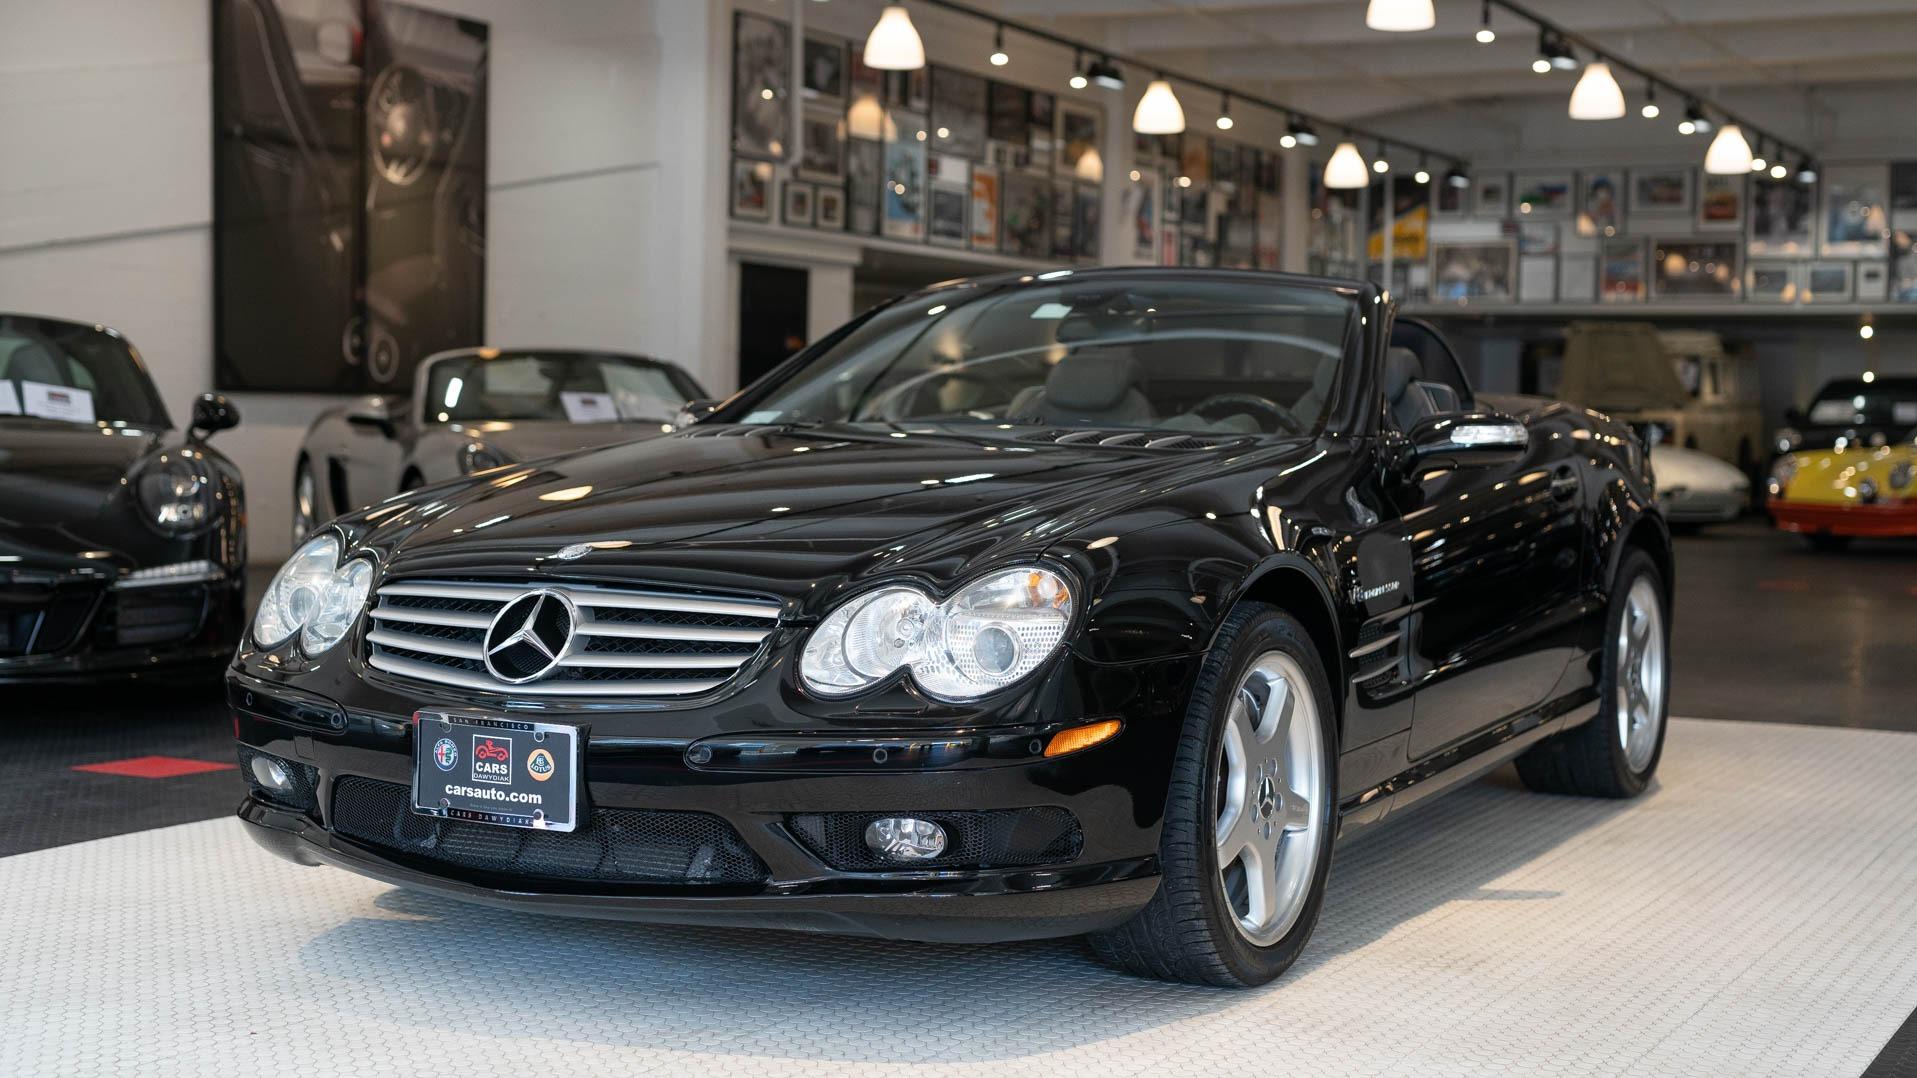 Used 2005 Mercedes Benz SL Class SL 55 AMG